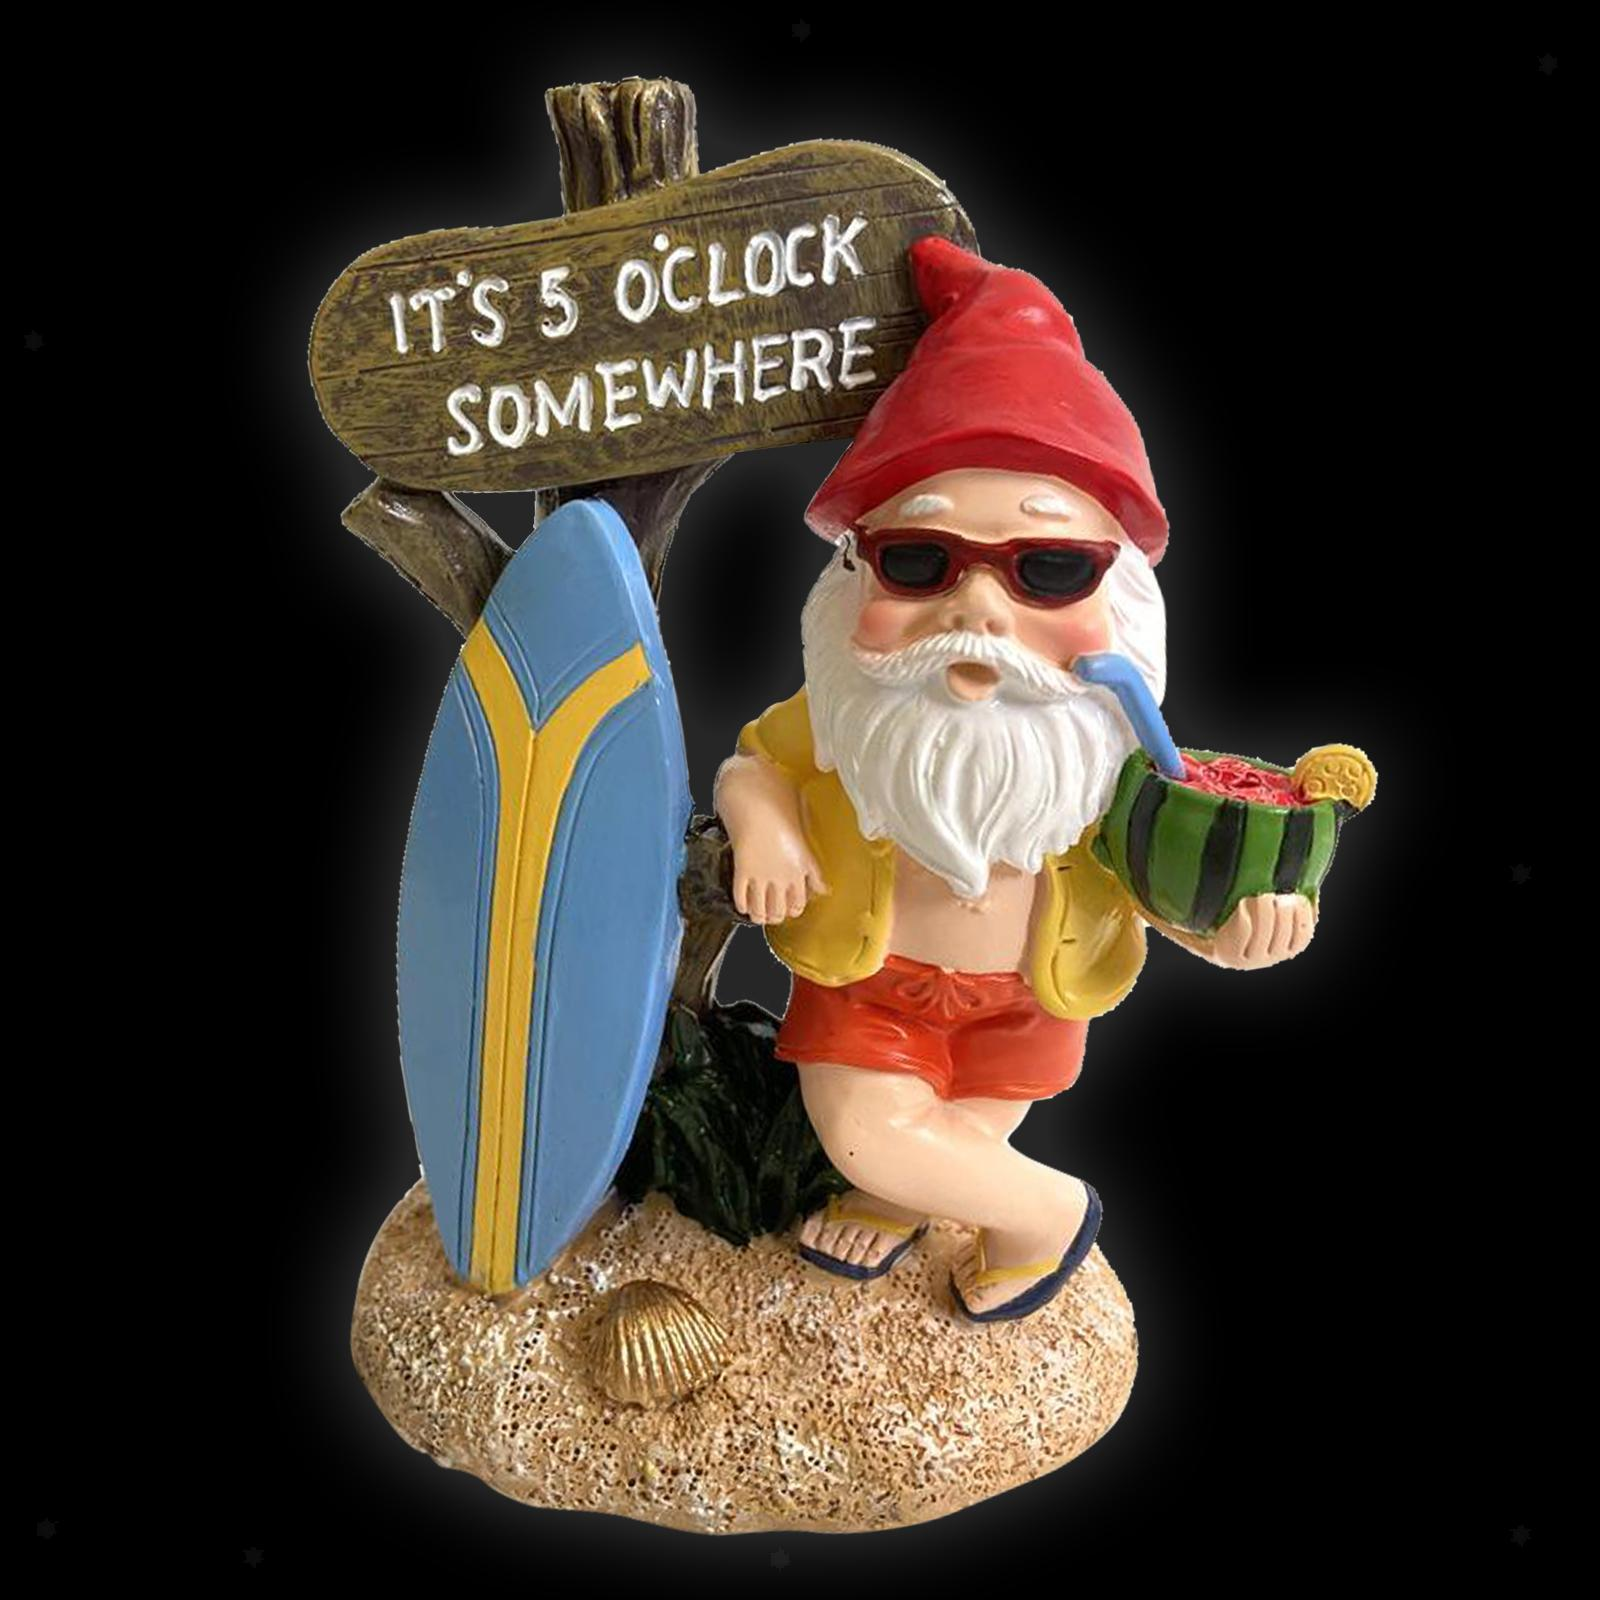 thumbnail 13 - Funny Resin Naughty Garden Gnome Statue Ornaments Villa Home Figurines Decor